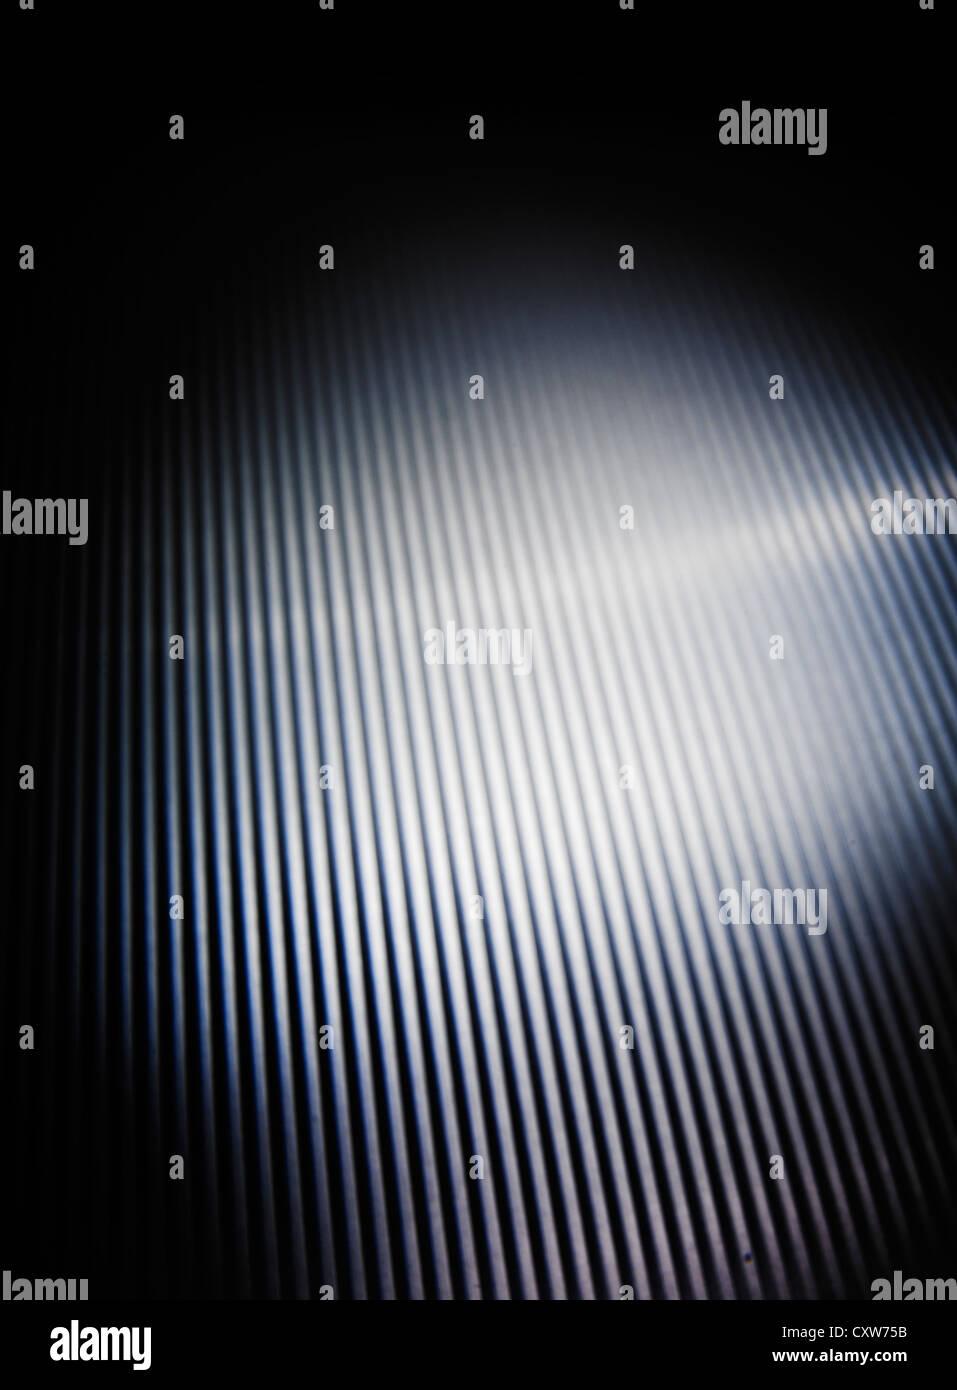 Metallic background ridged spotlit - Stock Image